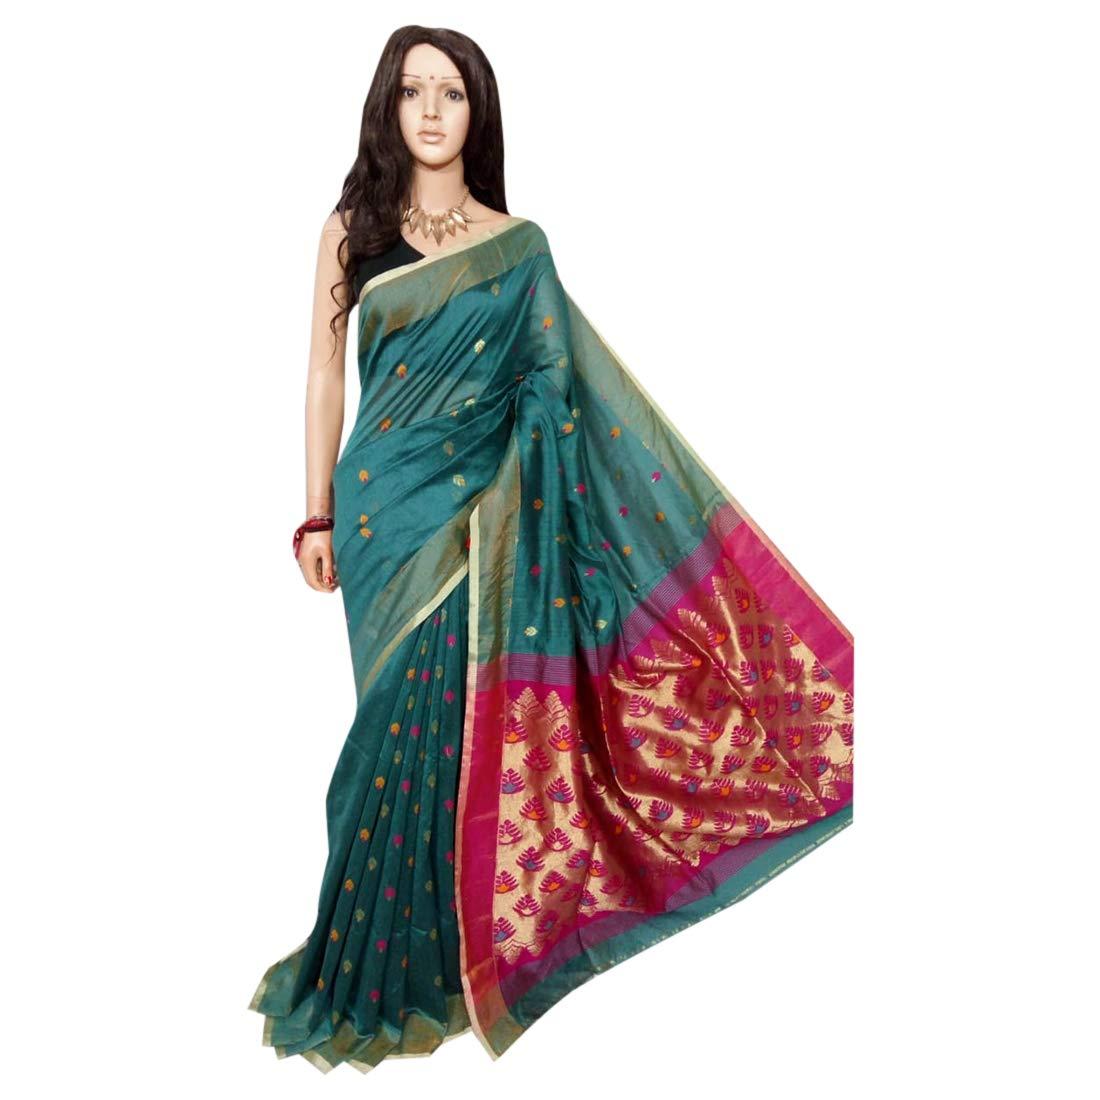 Indian Saree Ethnic dhakai jamdani Designer Collection Sari Party Formal Women Wear 105a